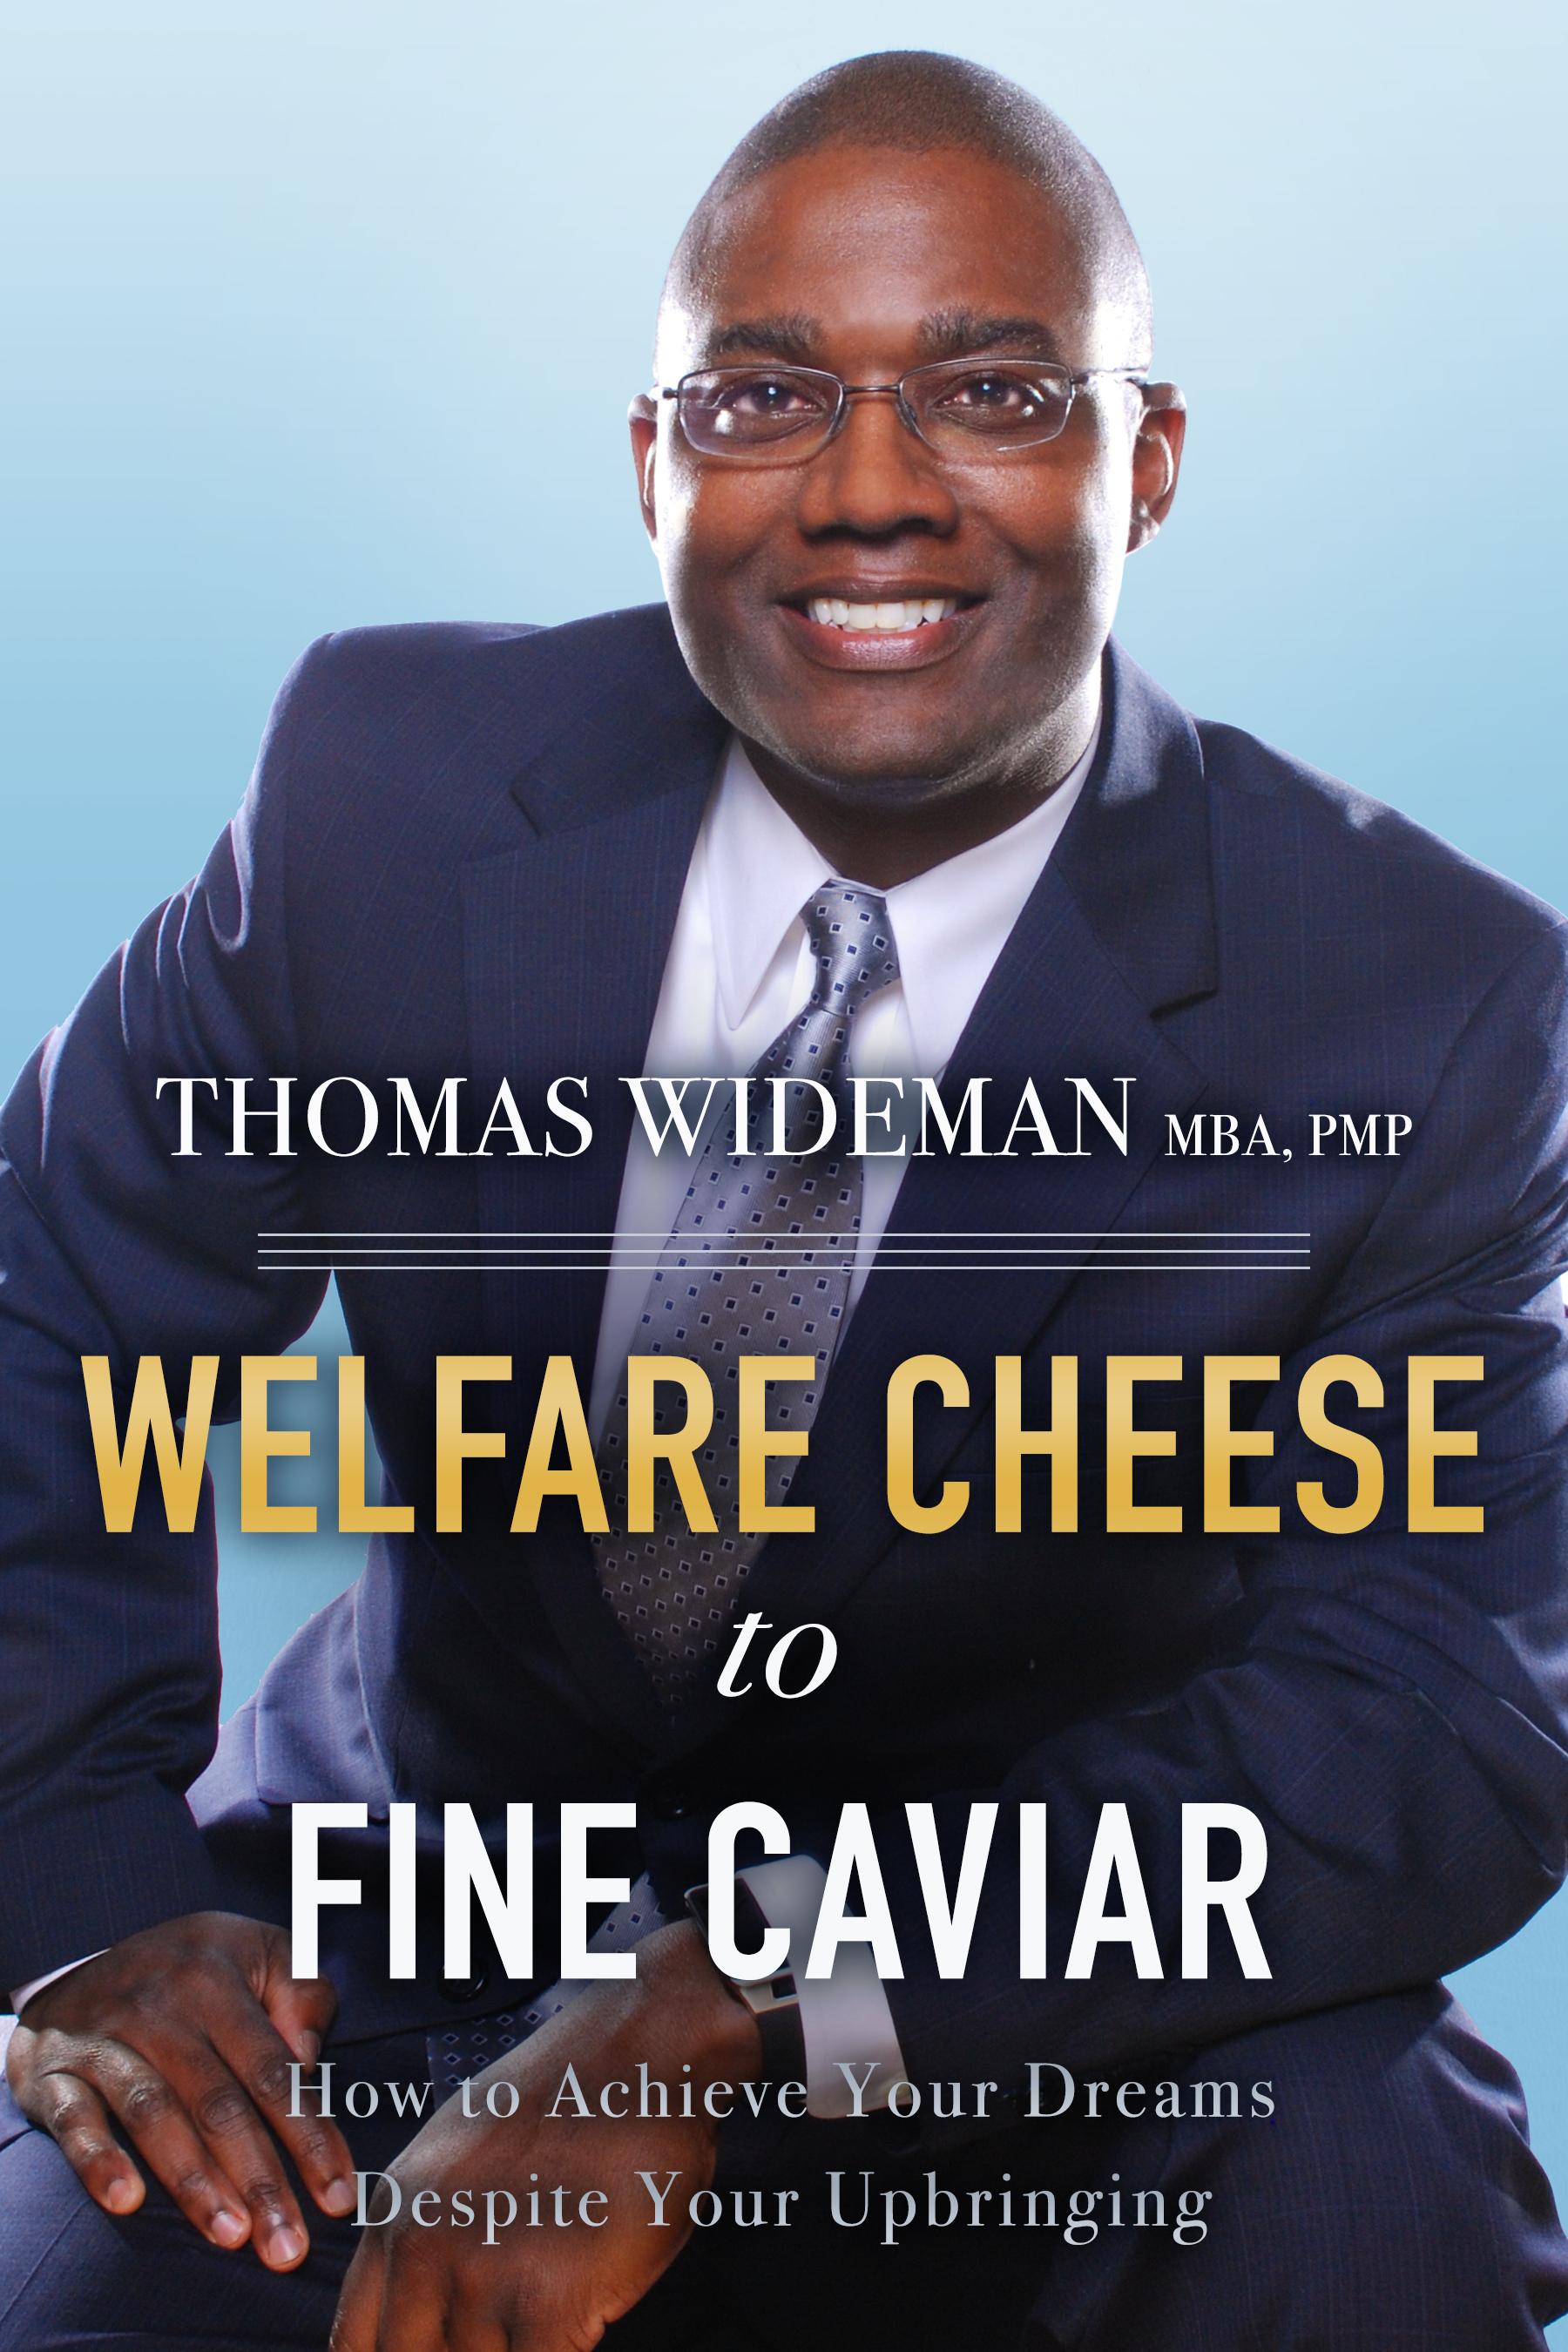 WELFARE CHEESE TO FINE CAVIAR